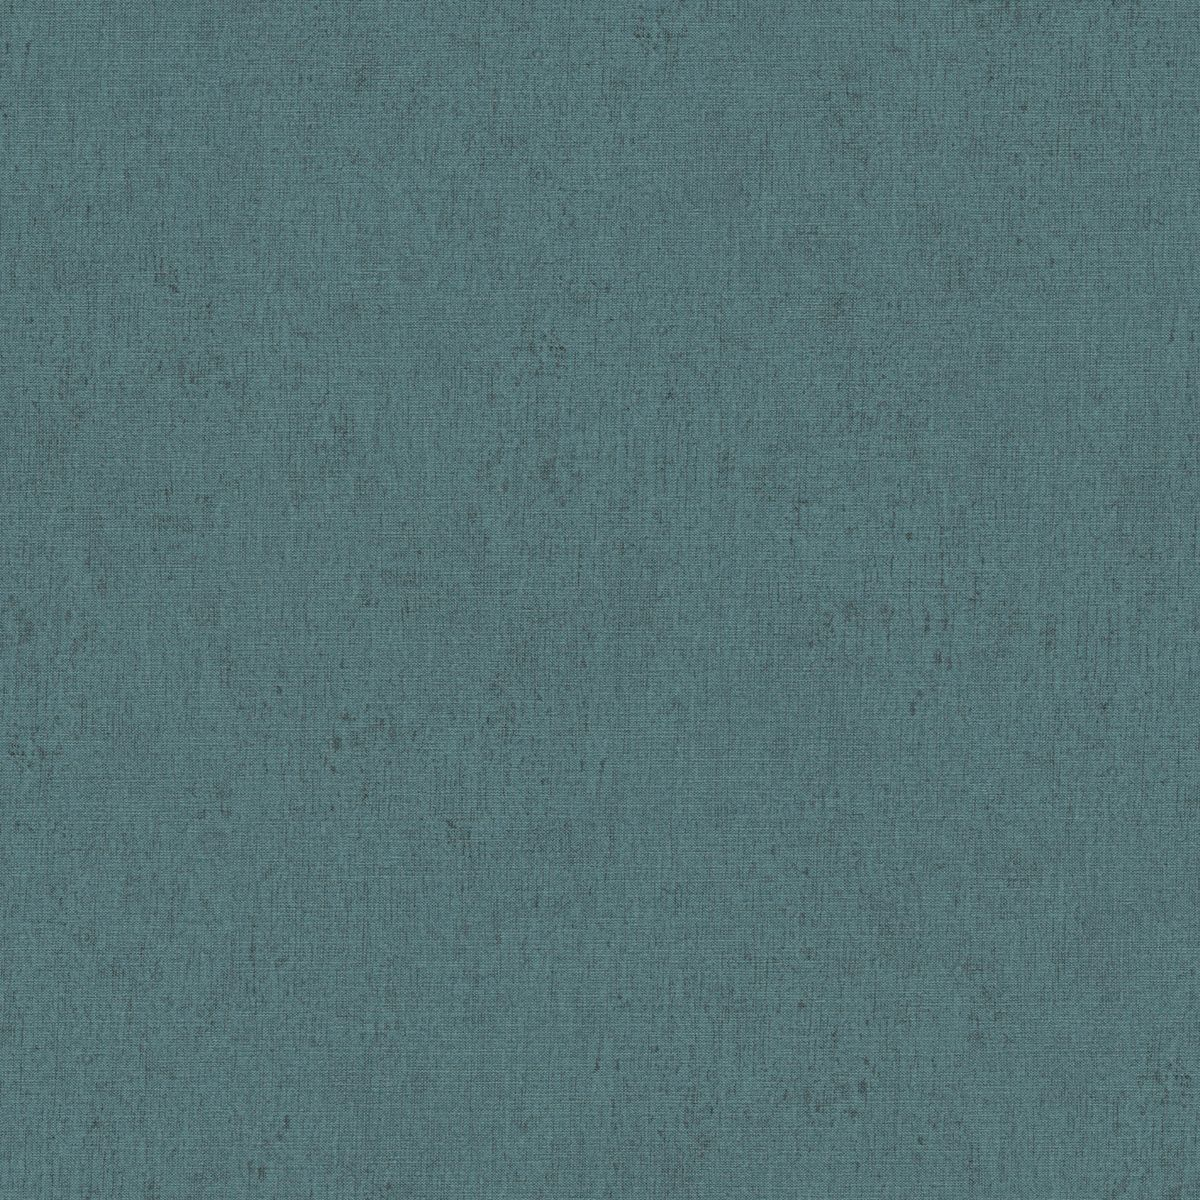 Papier peint canard Crosby intissé